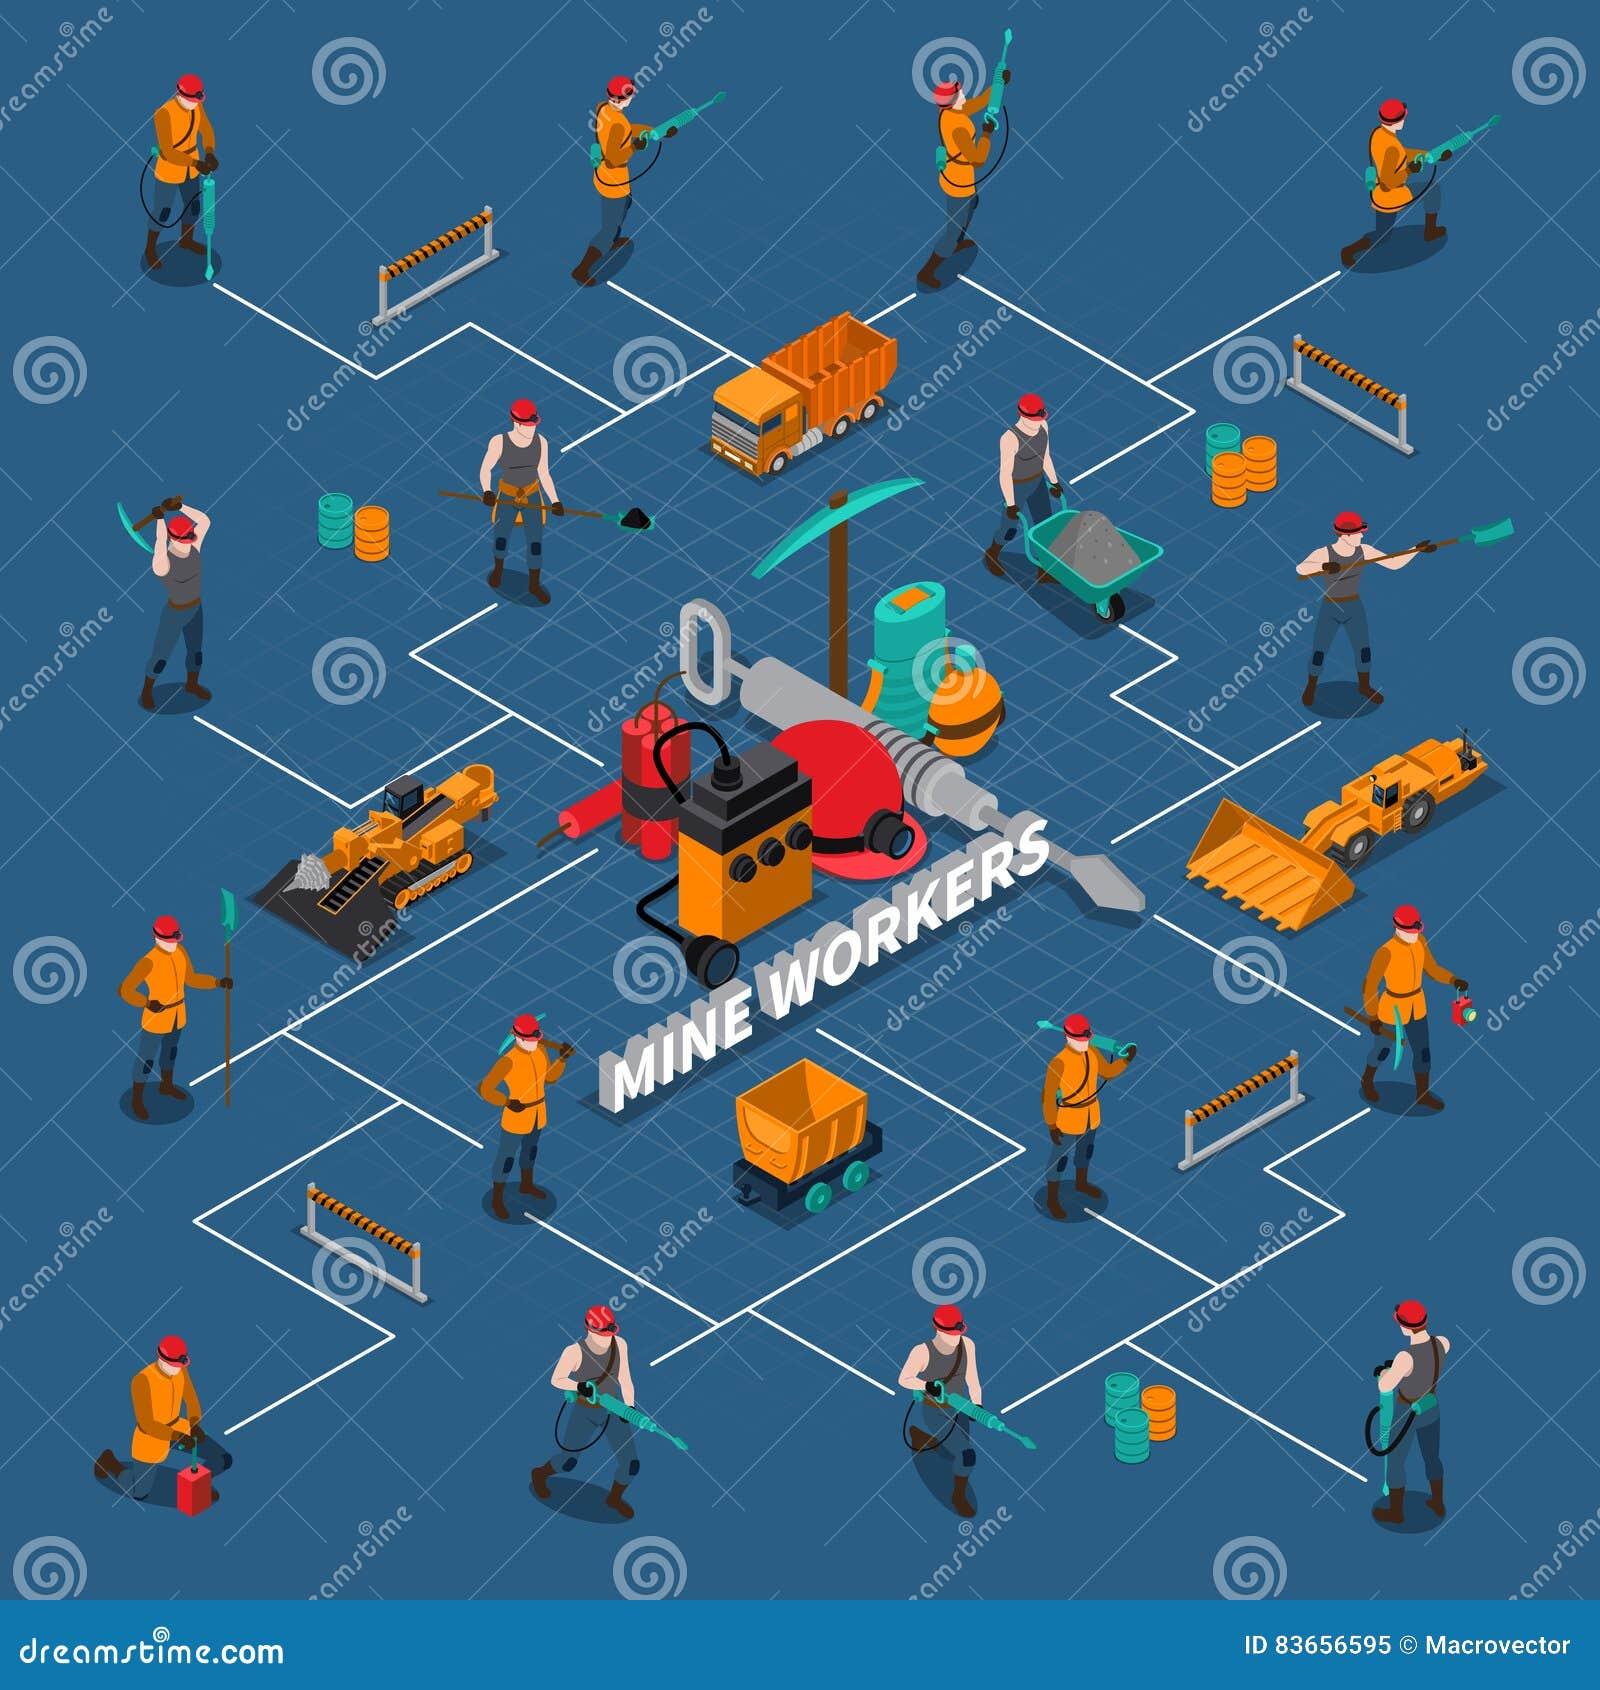 Miner People Isometric Flowchart Stock Vector Illustration Of